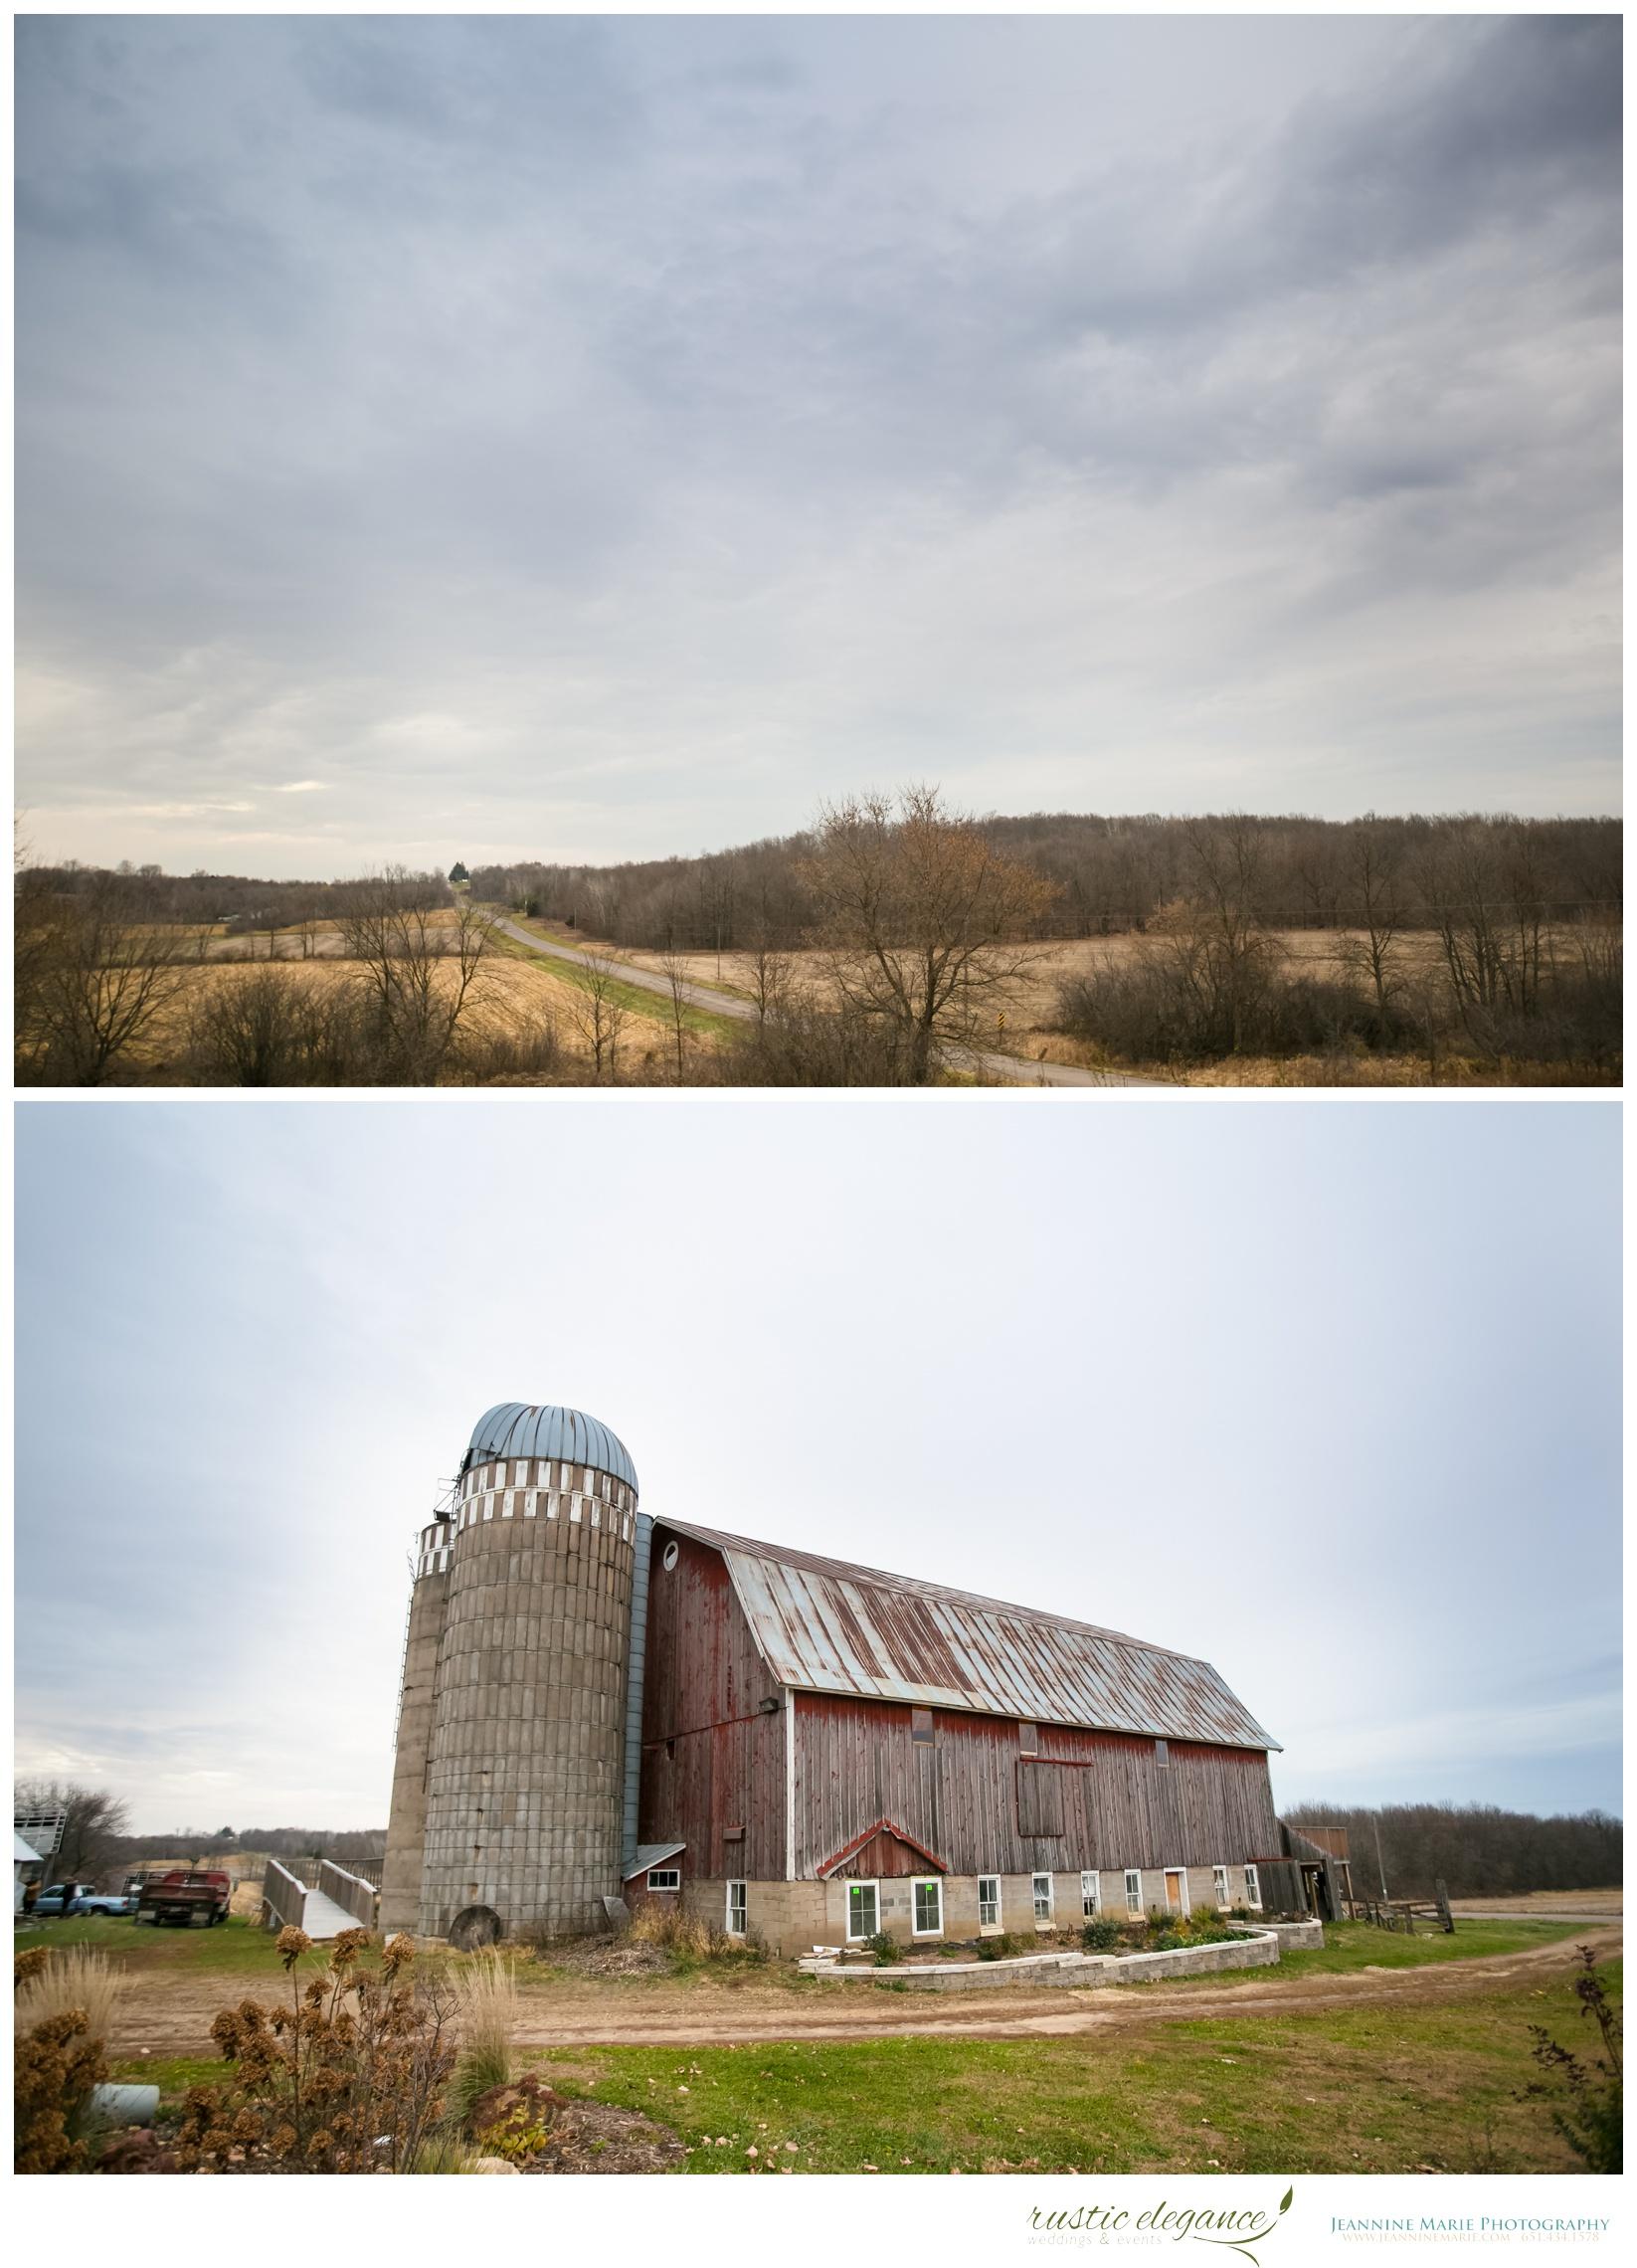 Lost River Barn, Rustic Elegance, Minnesota wedding photographer, Twin Cities weddings photographer, mnbride_0658.jpg